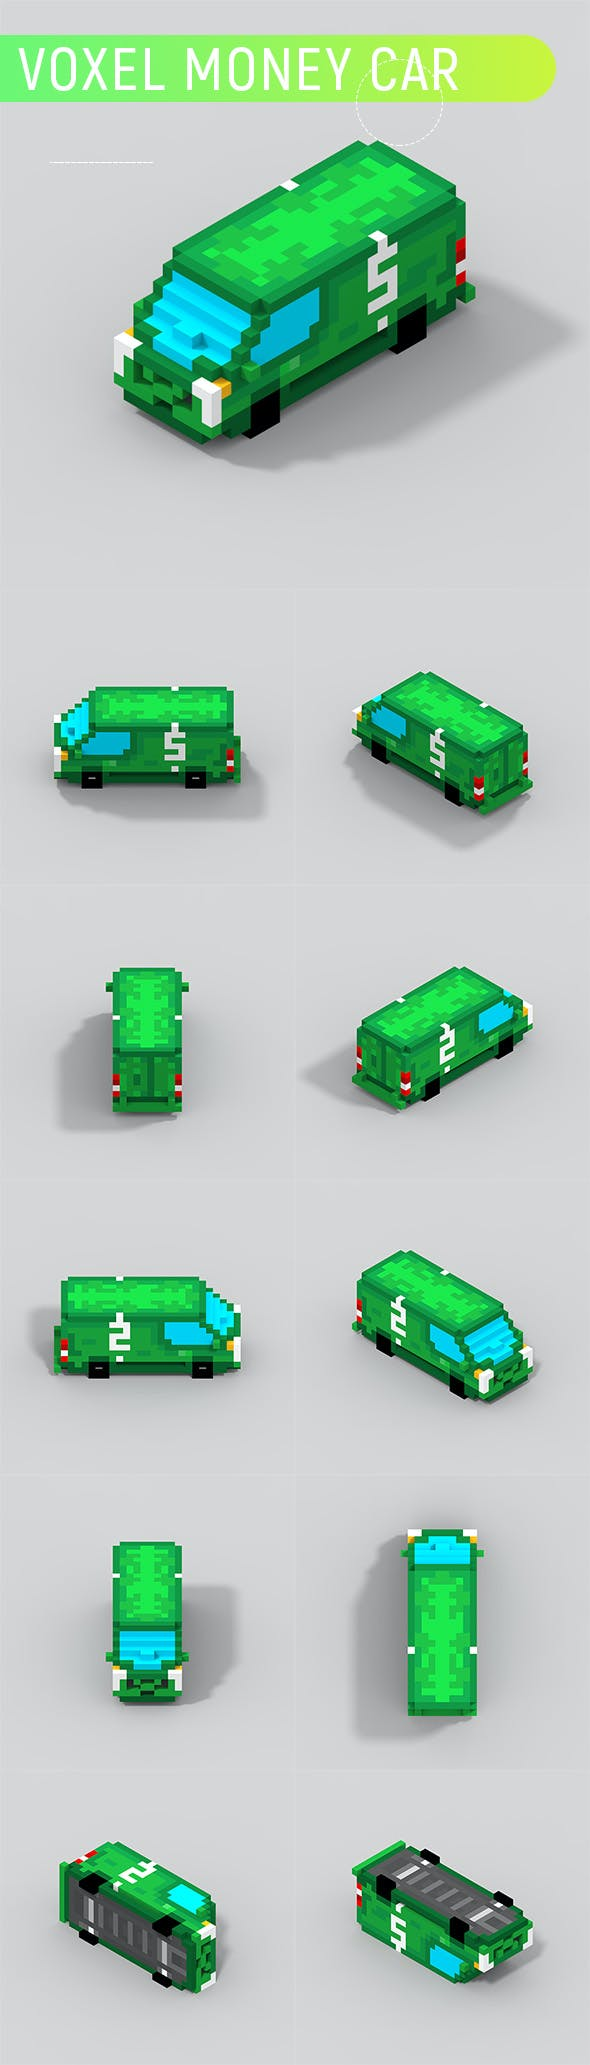 Voxel Money Car - 3DOcean Item for Sale